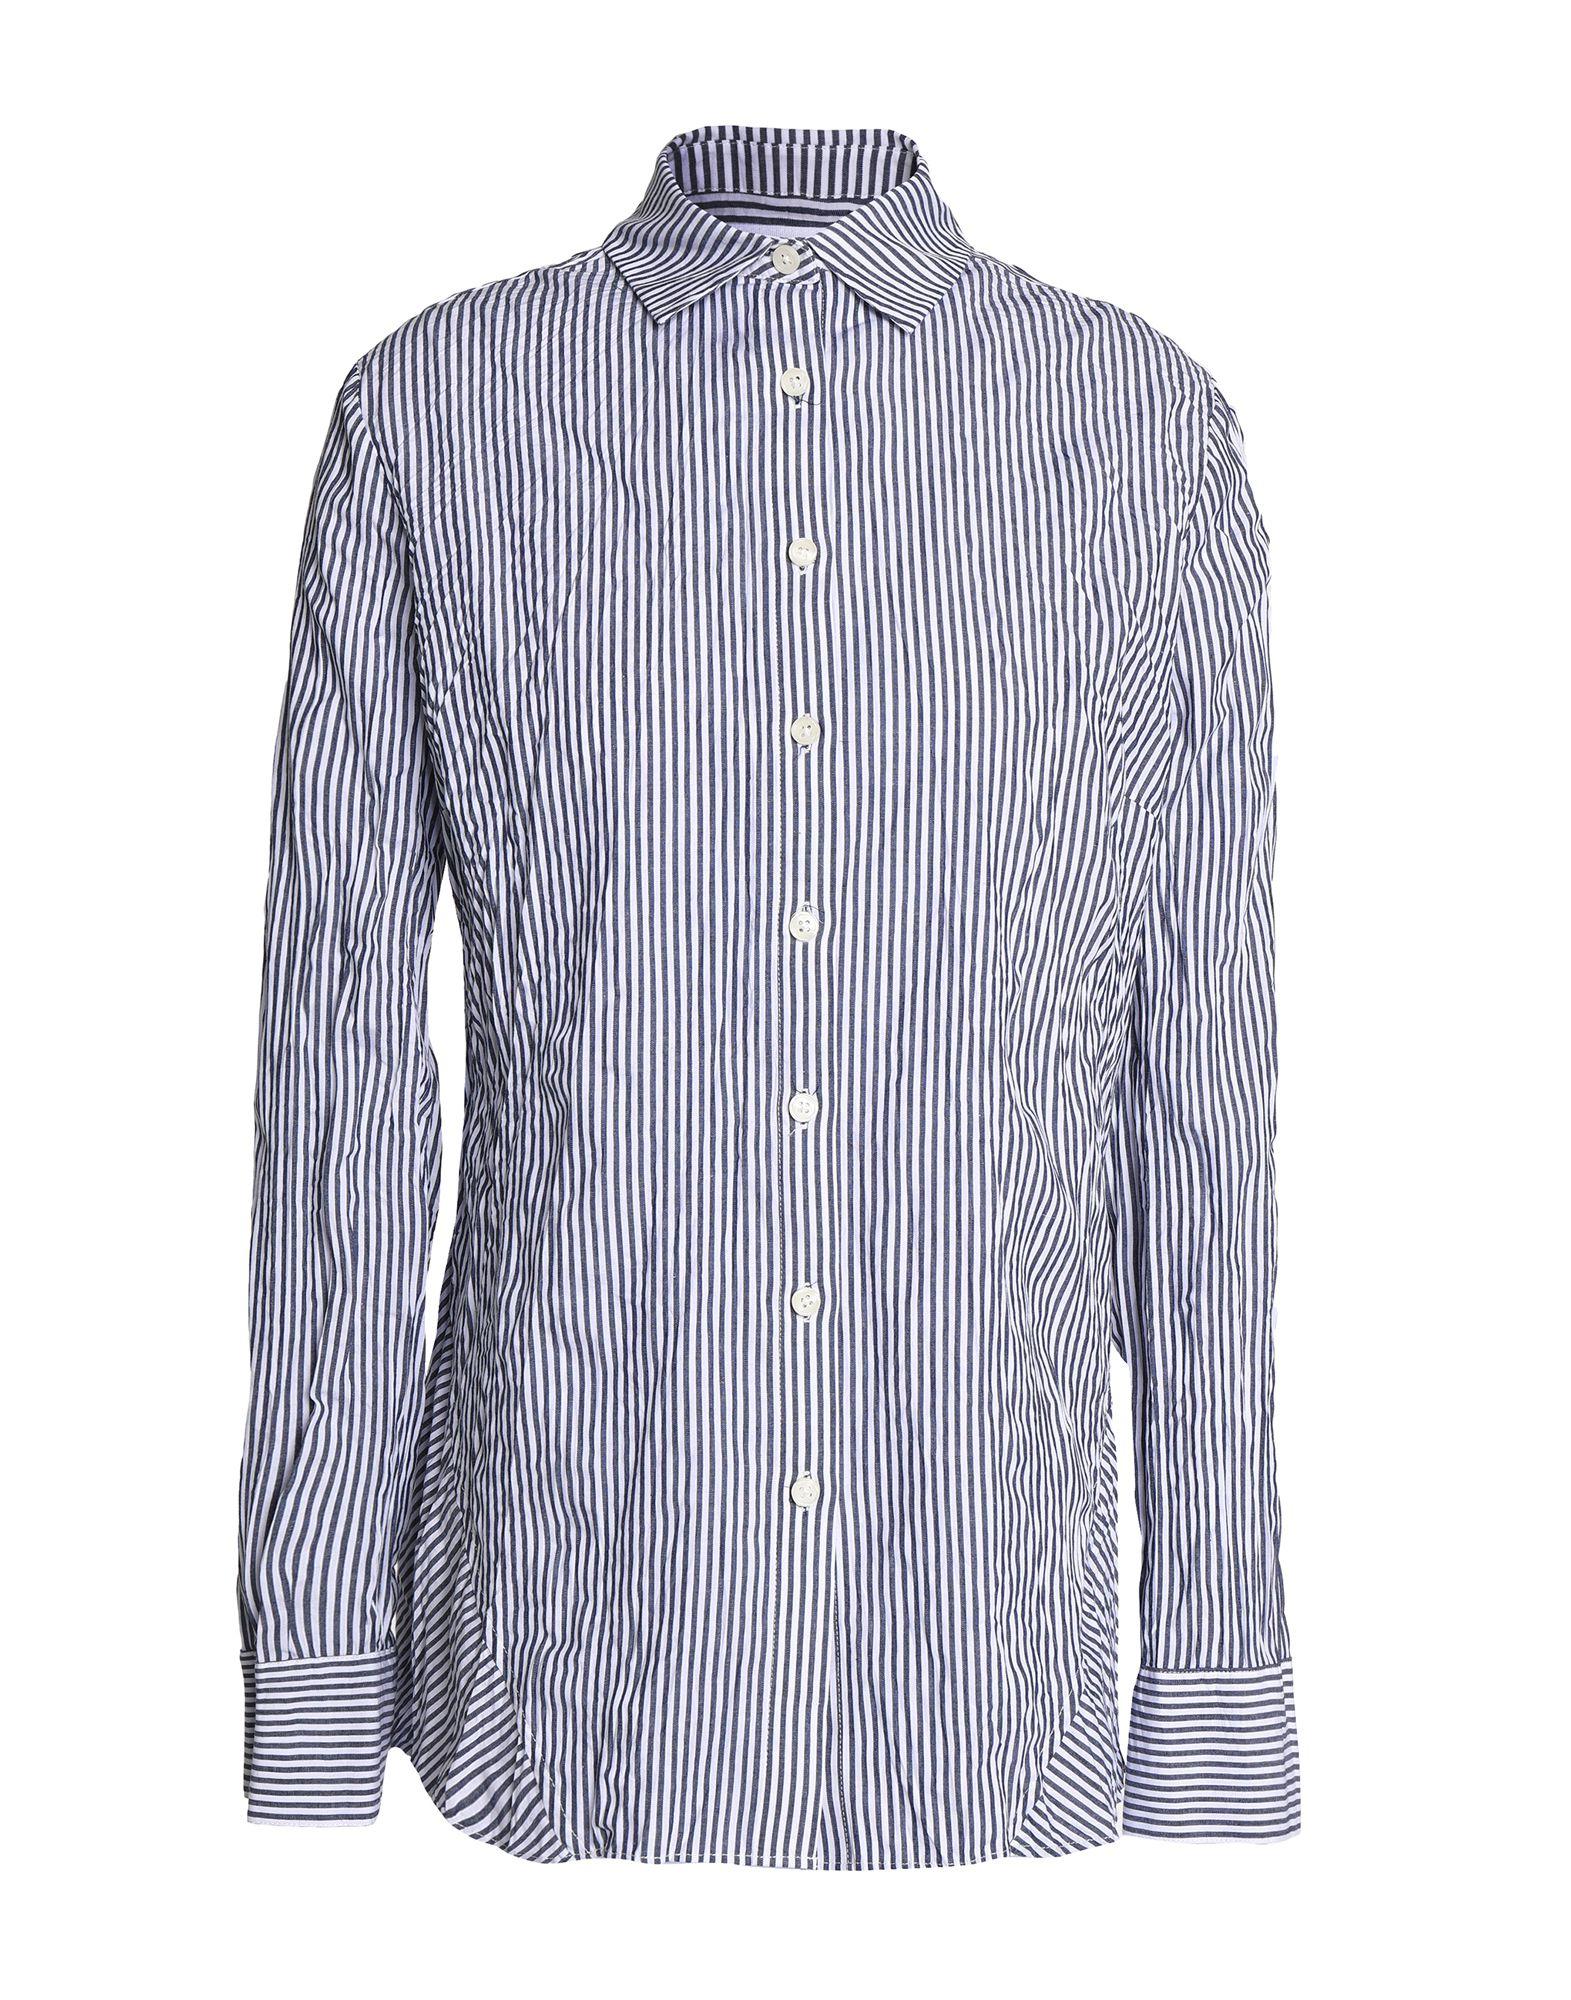 DEREK LAM 10 CROSBY Pубашка